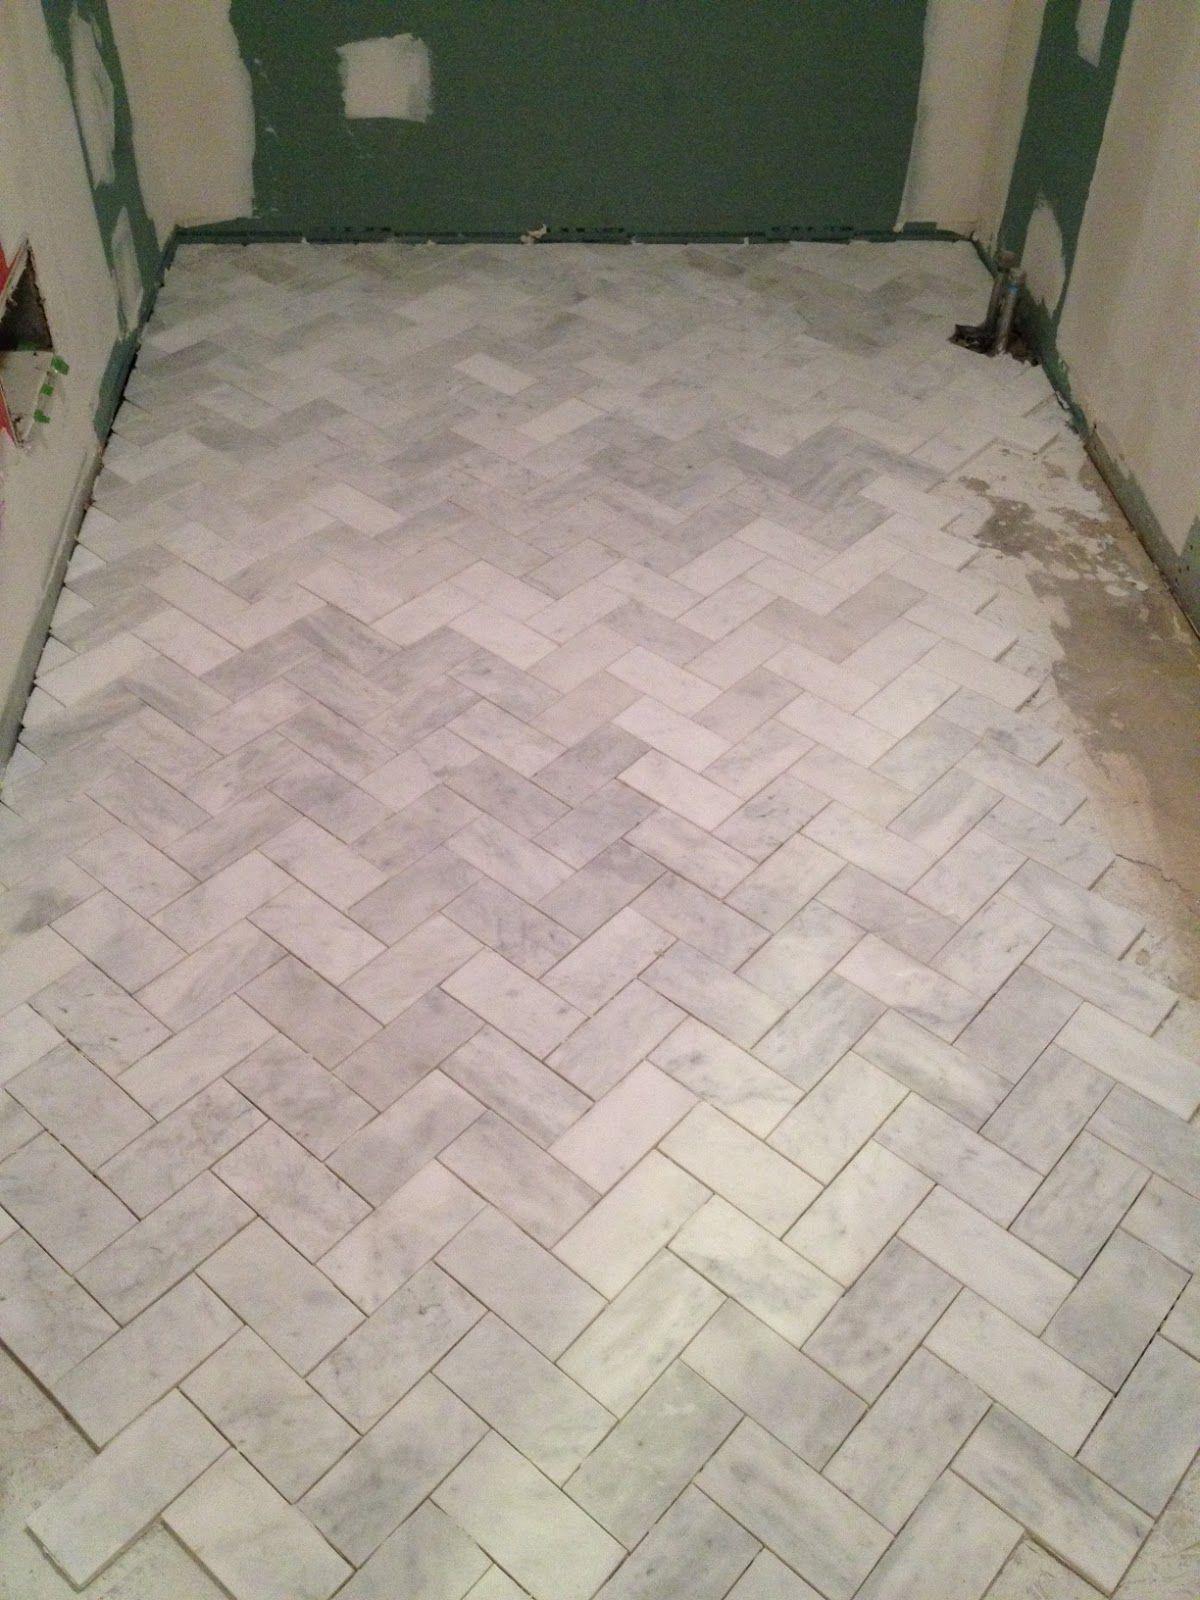 gray and white herringbone tile floors photo of the